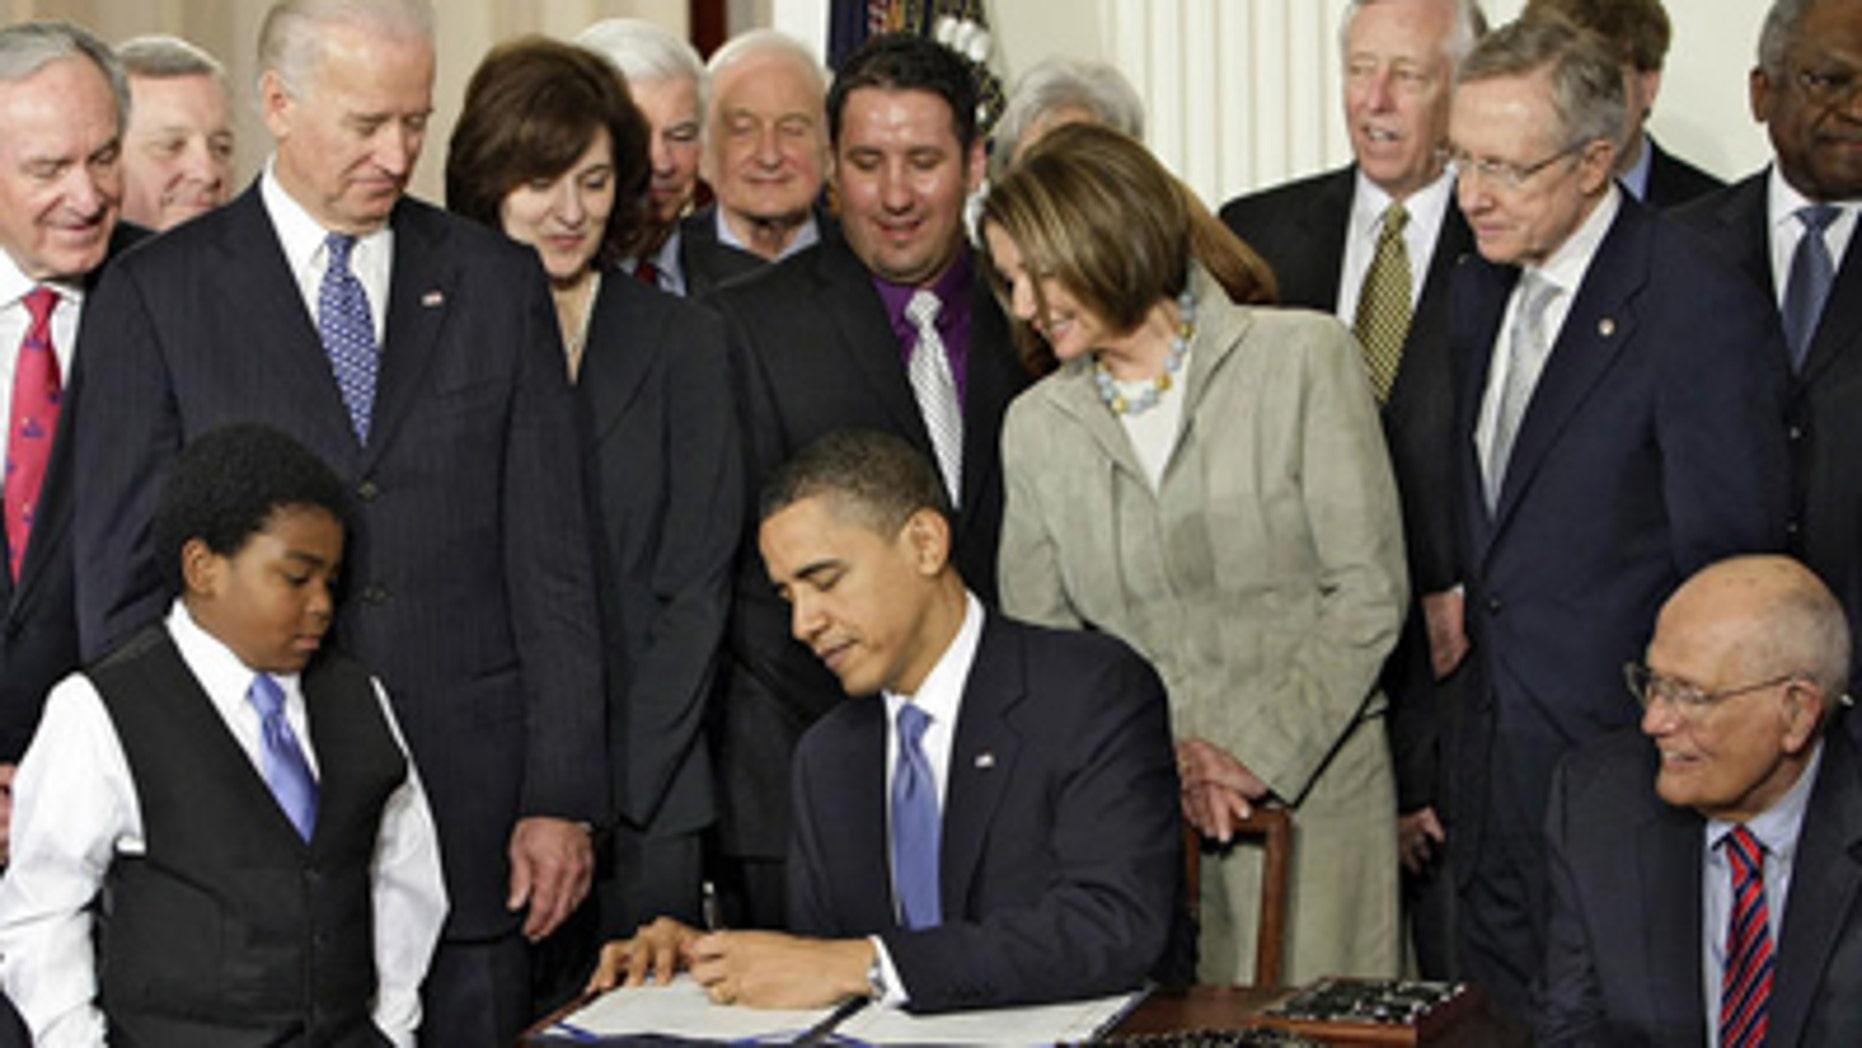 U.S. President Barack Obama singing the Health Care Reform bill in Washington, D.C.